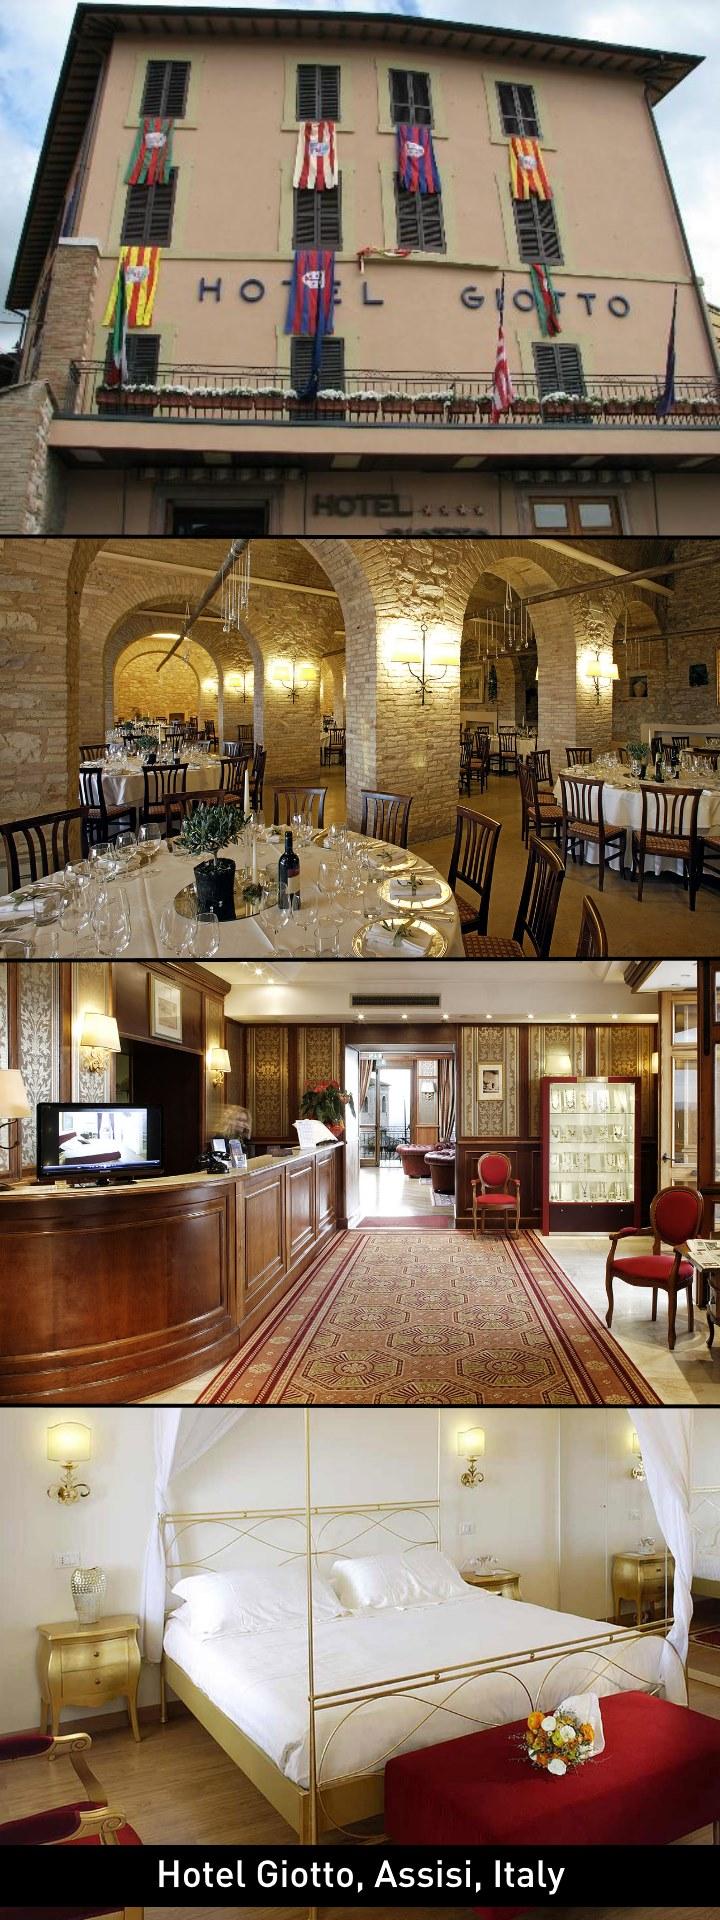 Hotel Giotto.jpg